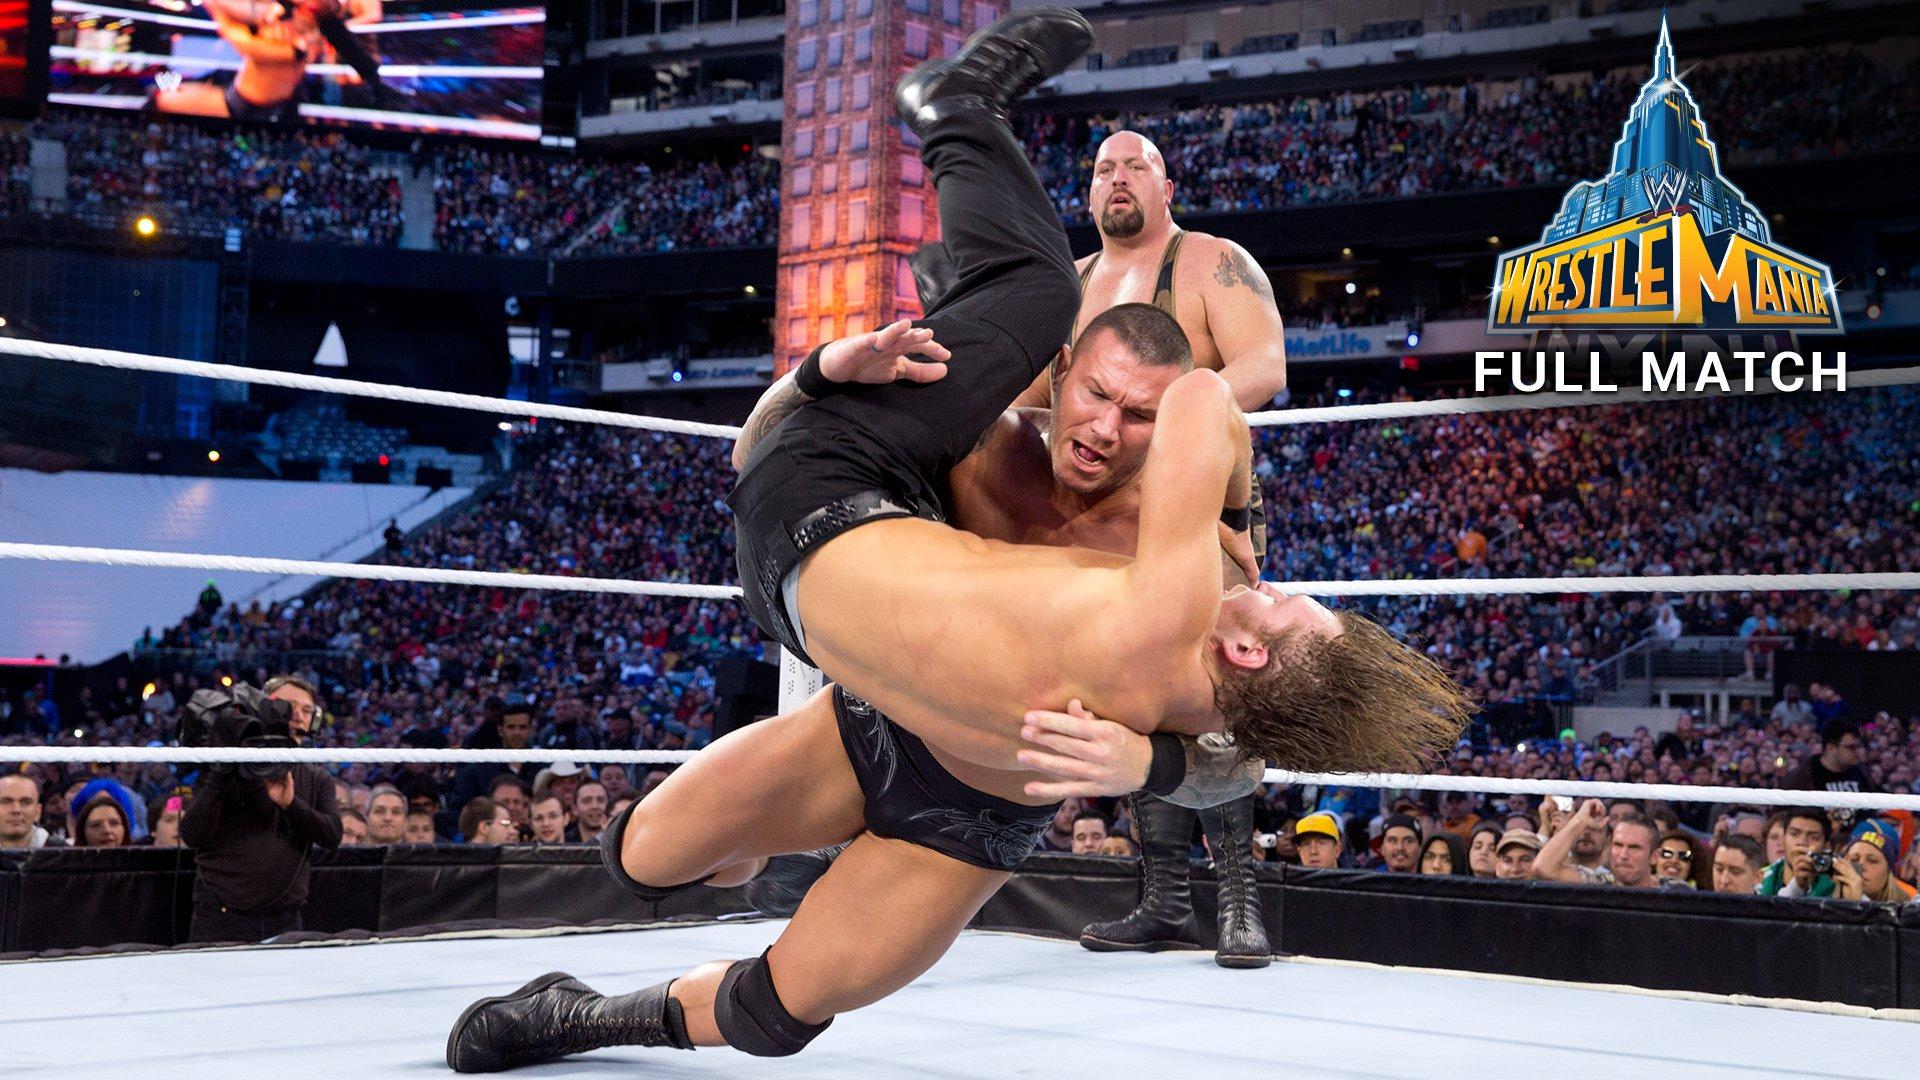 Randy Orton, Sheamus & Big Show vs. The Shield: WrestleMania 29 (Match intégral - Exclusivité WWE Network)